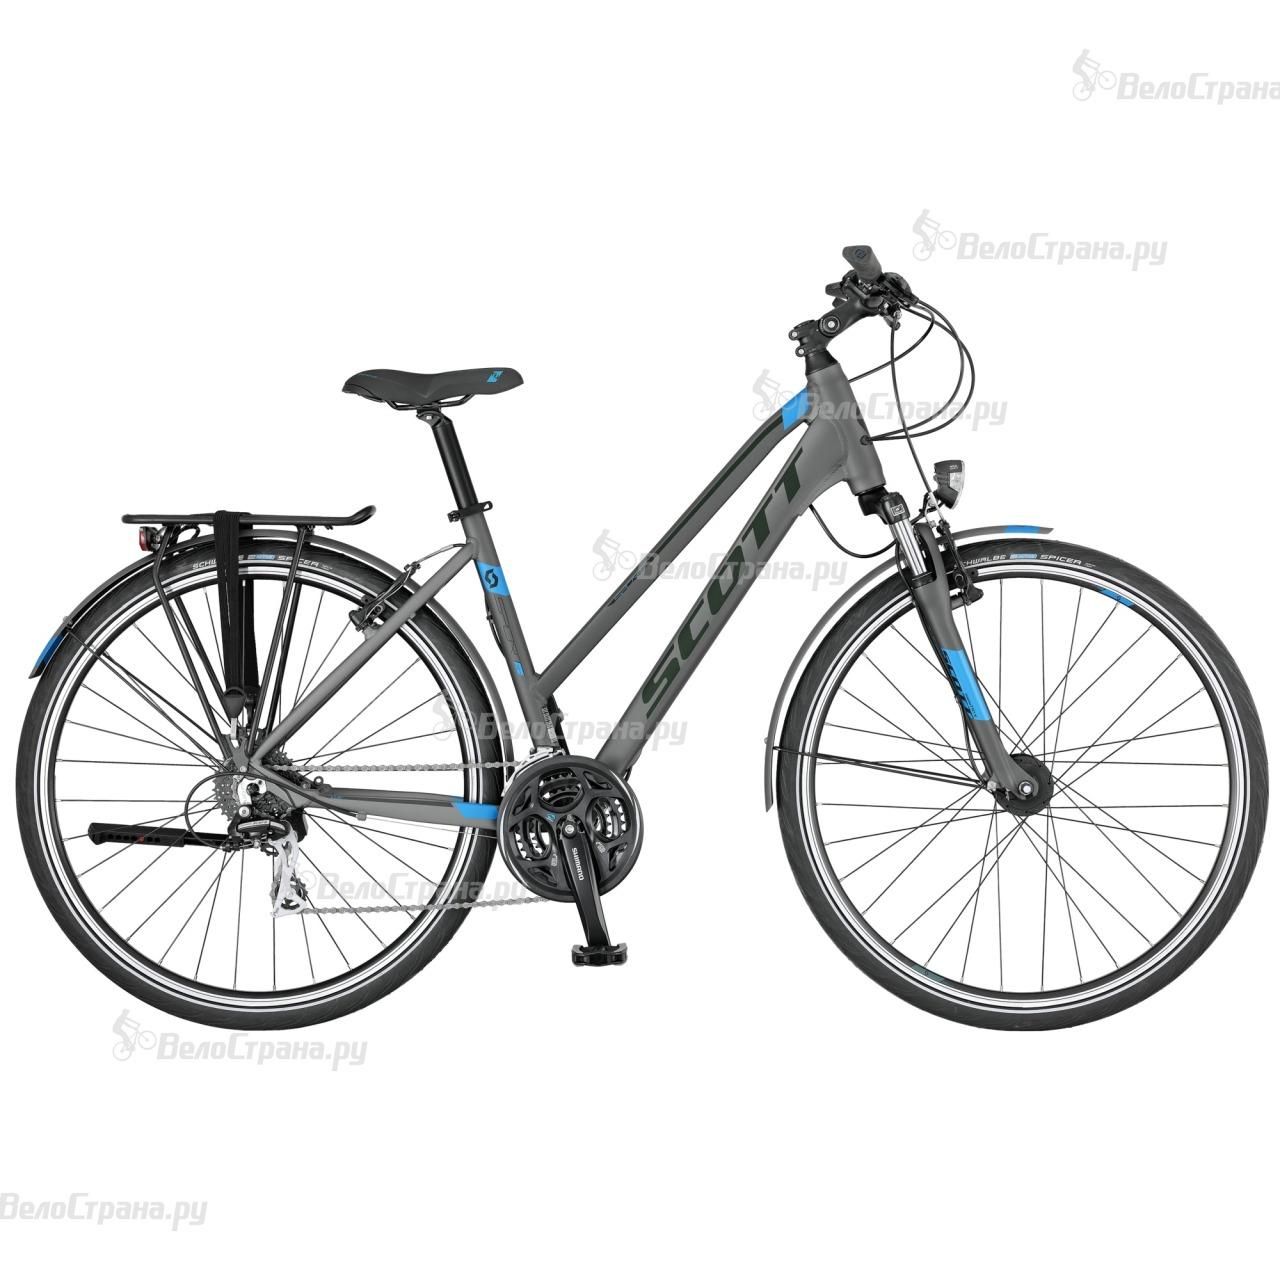 Велосипед Scott Sub Sport 30 Lady (2017)